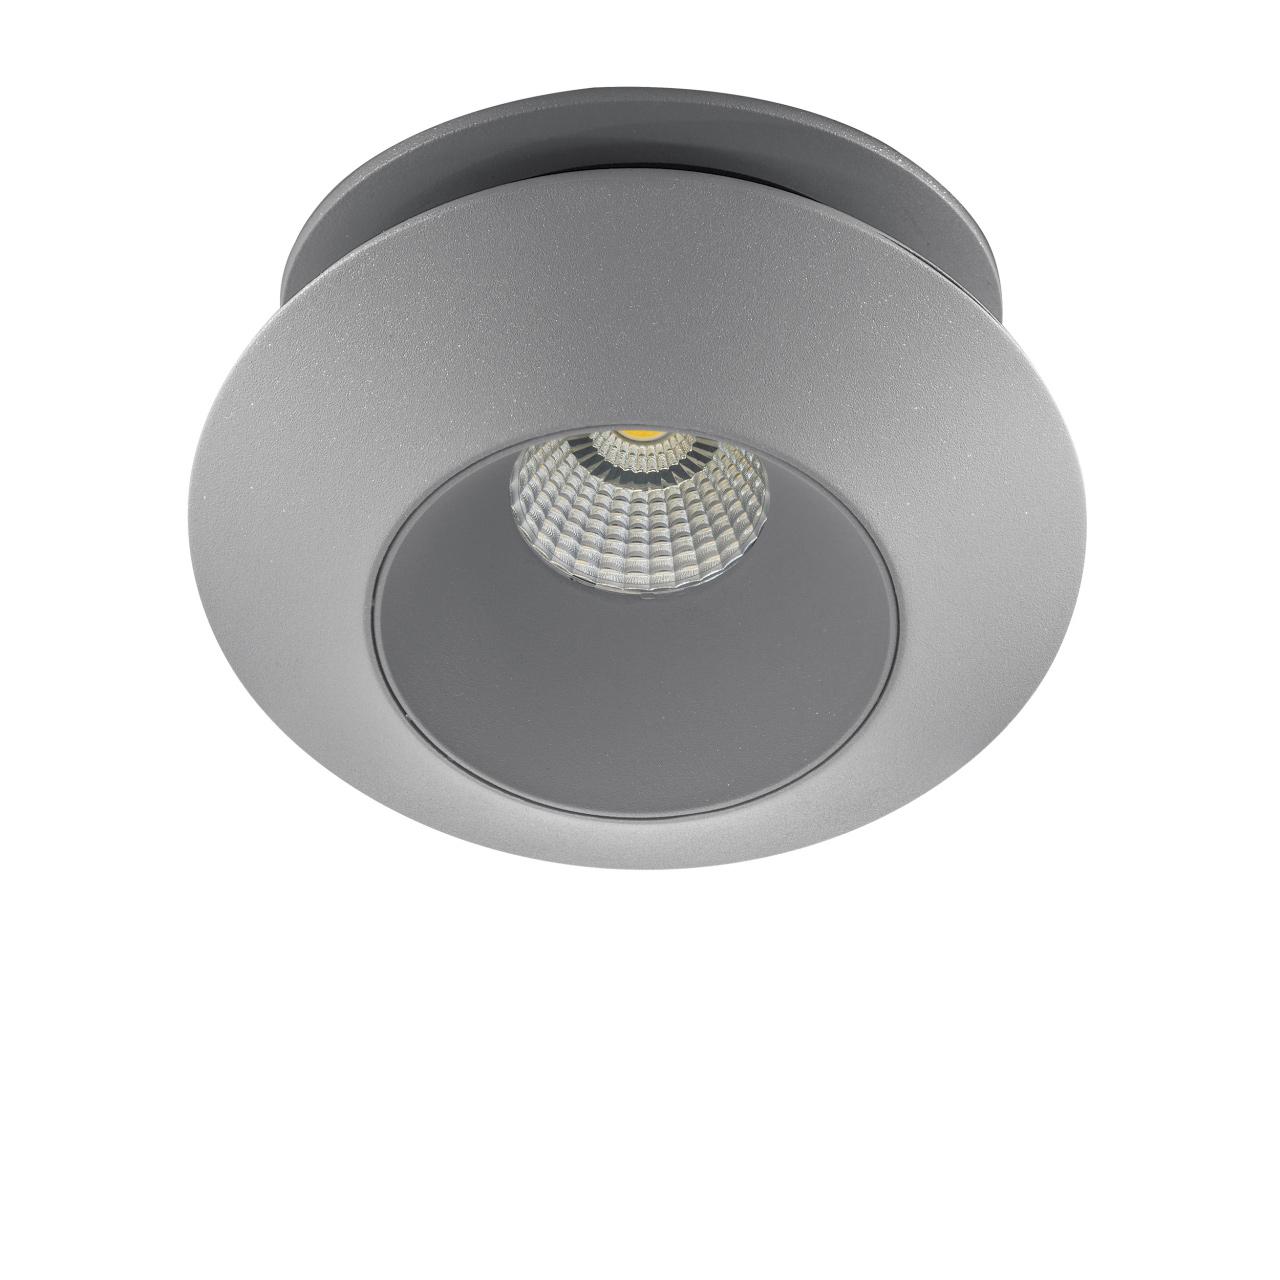 Светильник Orbe LED 15W 1240LM 60G серый 3000K Lightstar 051309